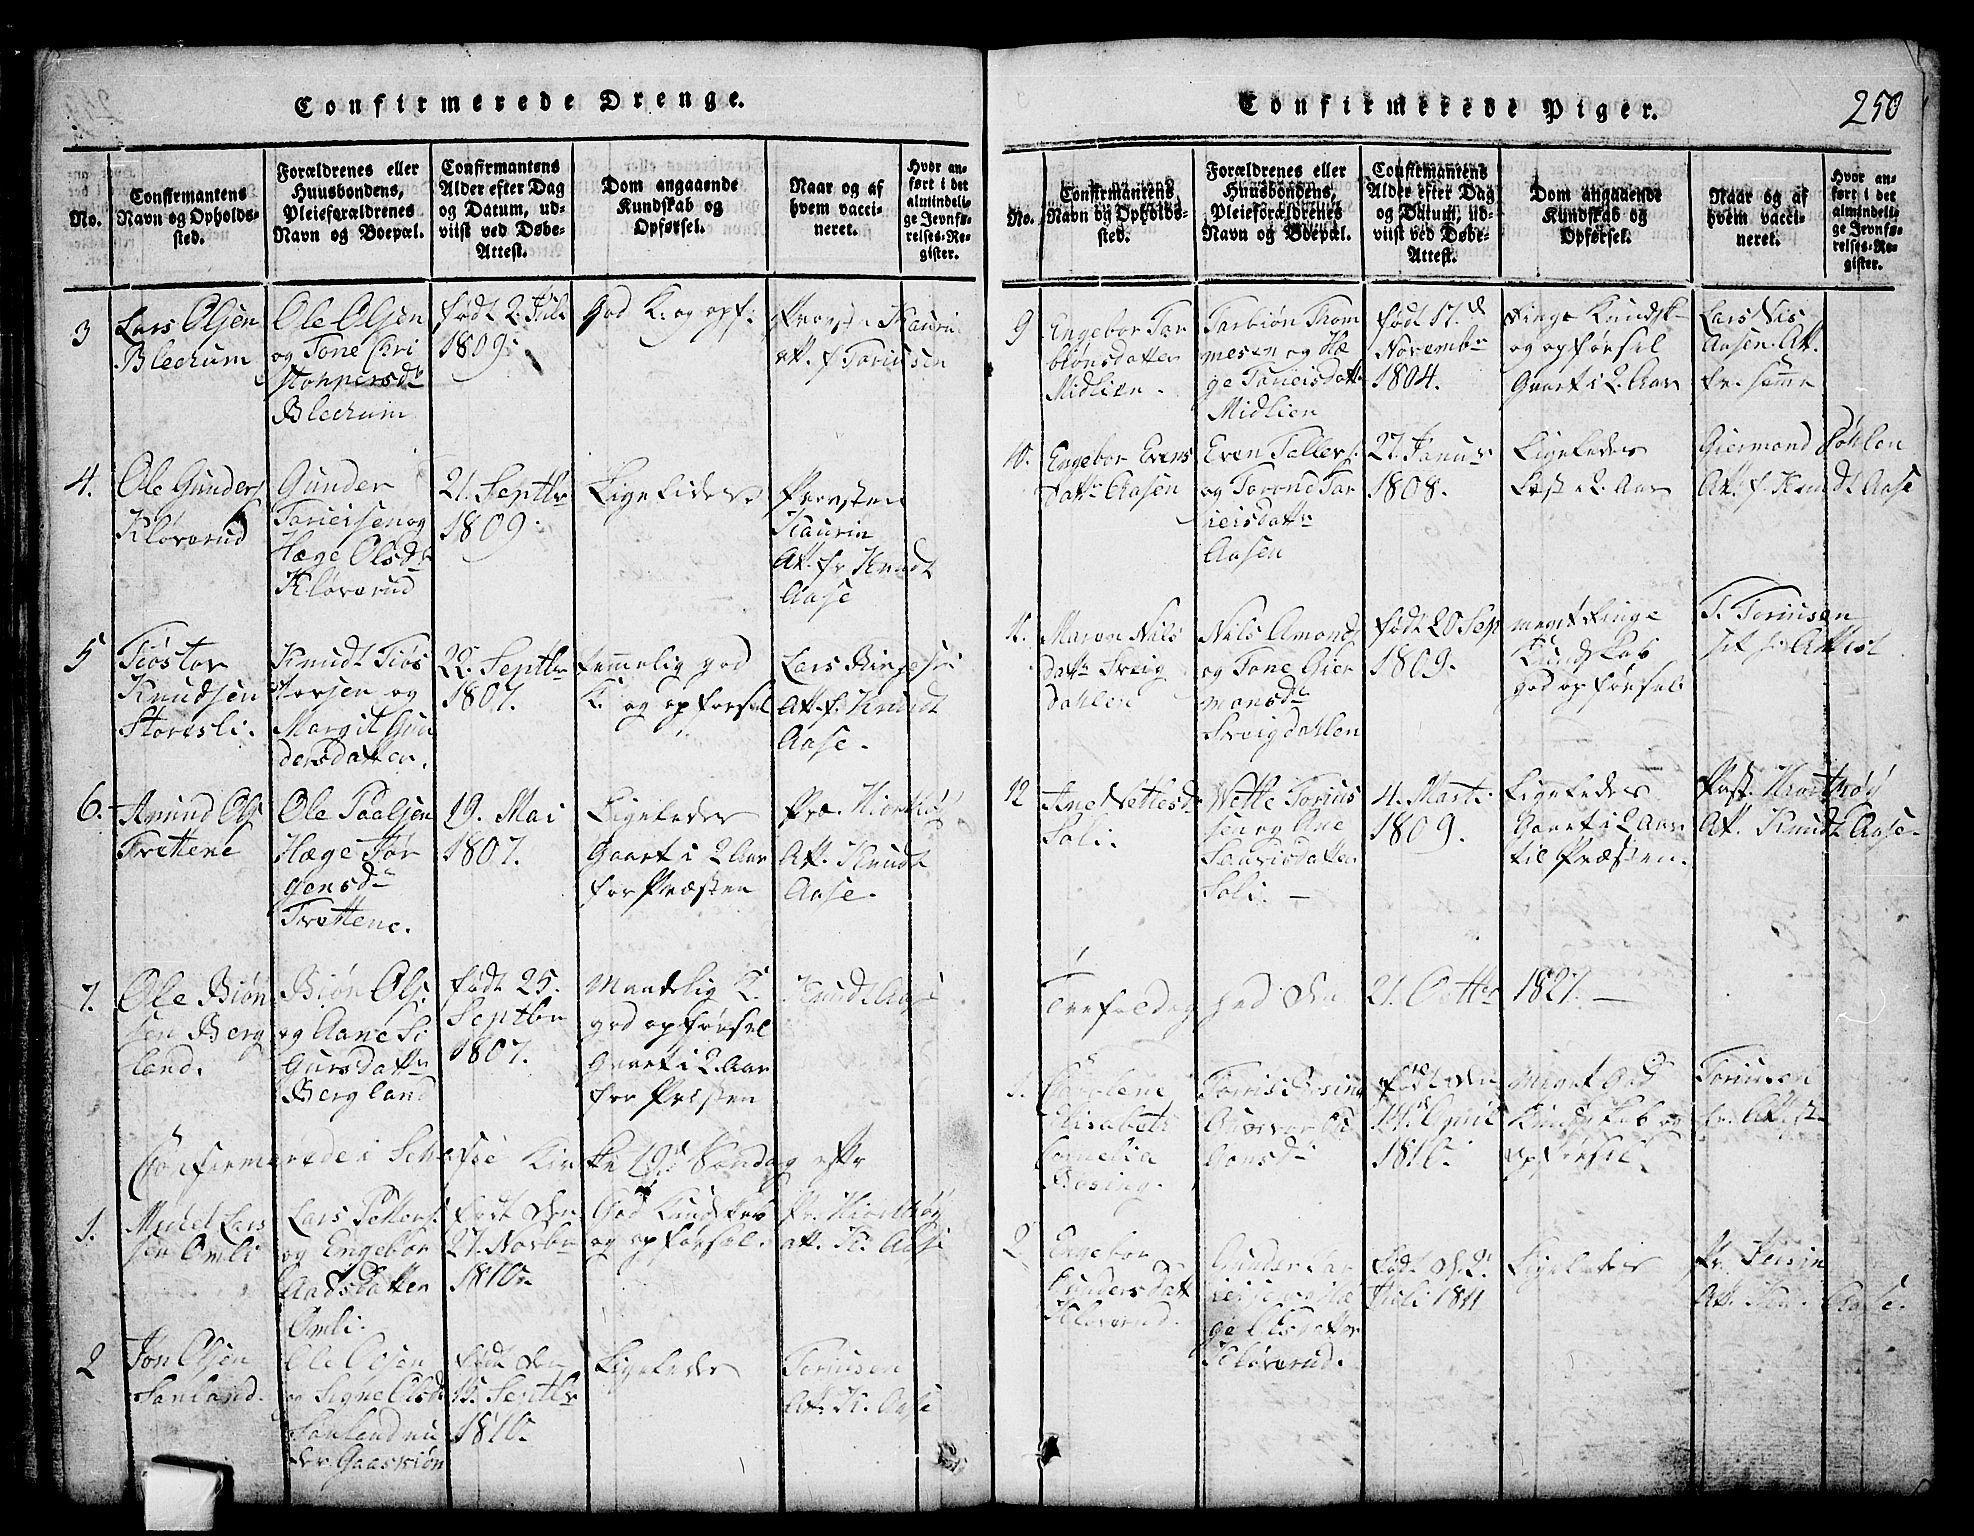 SAKO, Mo kirkebøker, G/Gb/L0001: Klokkerbok nr. II 1, 1814-1843, s. 250